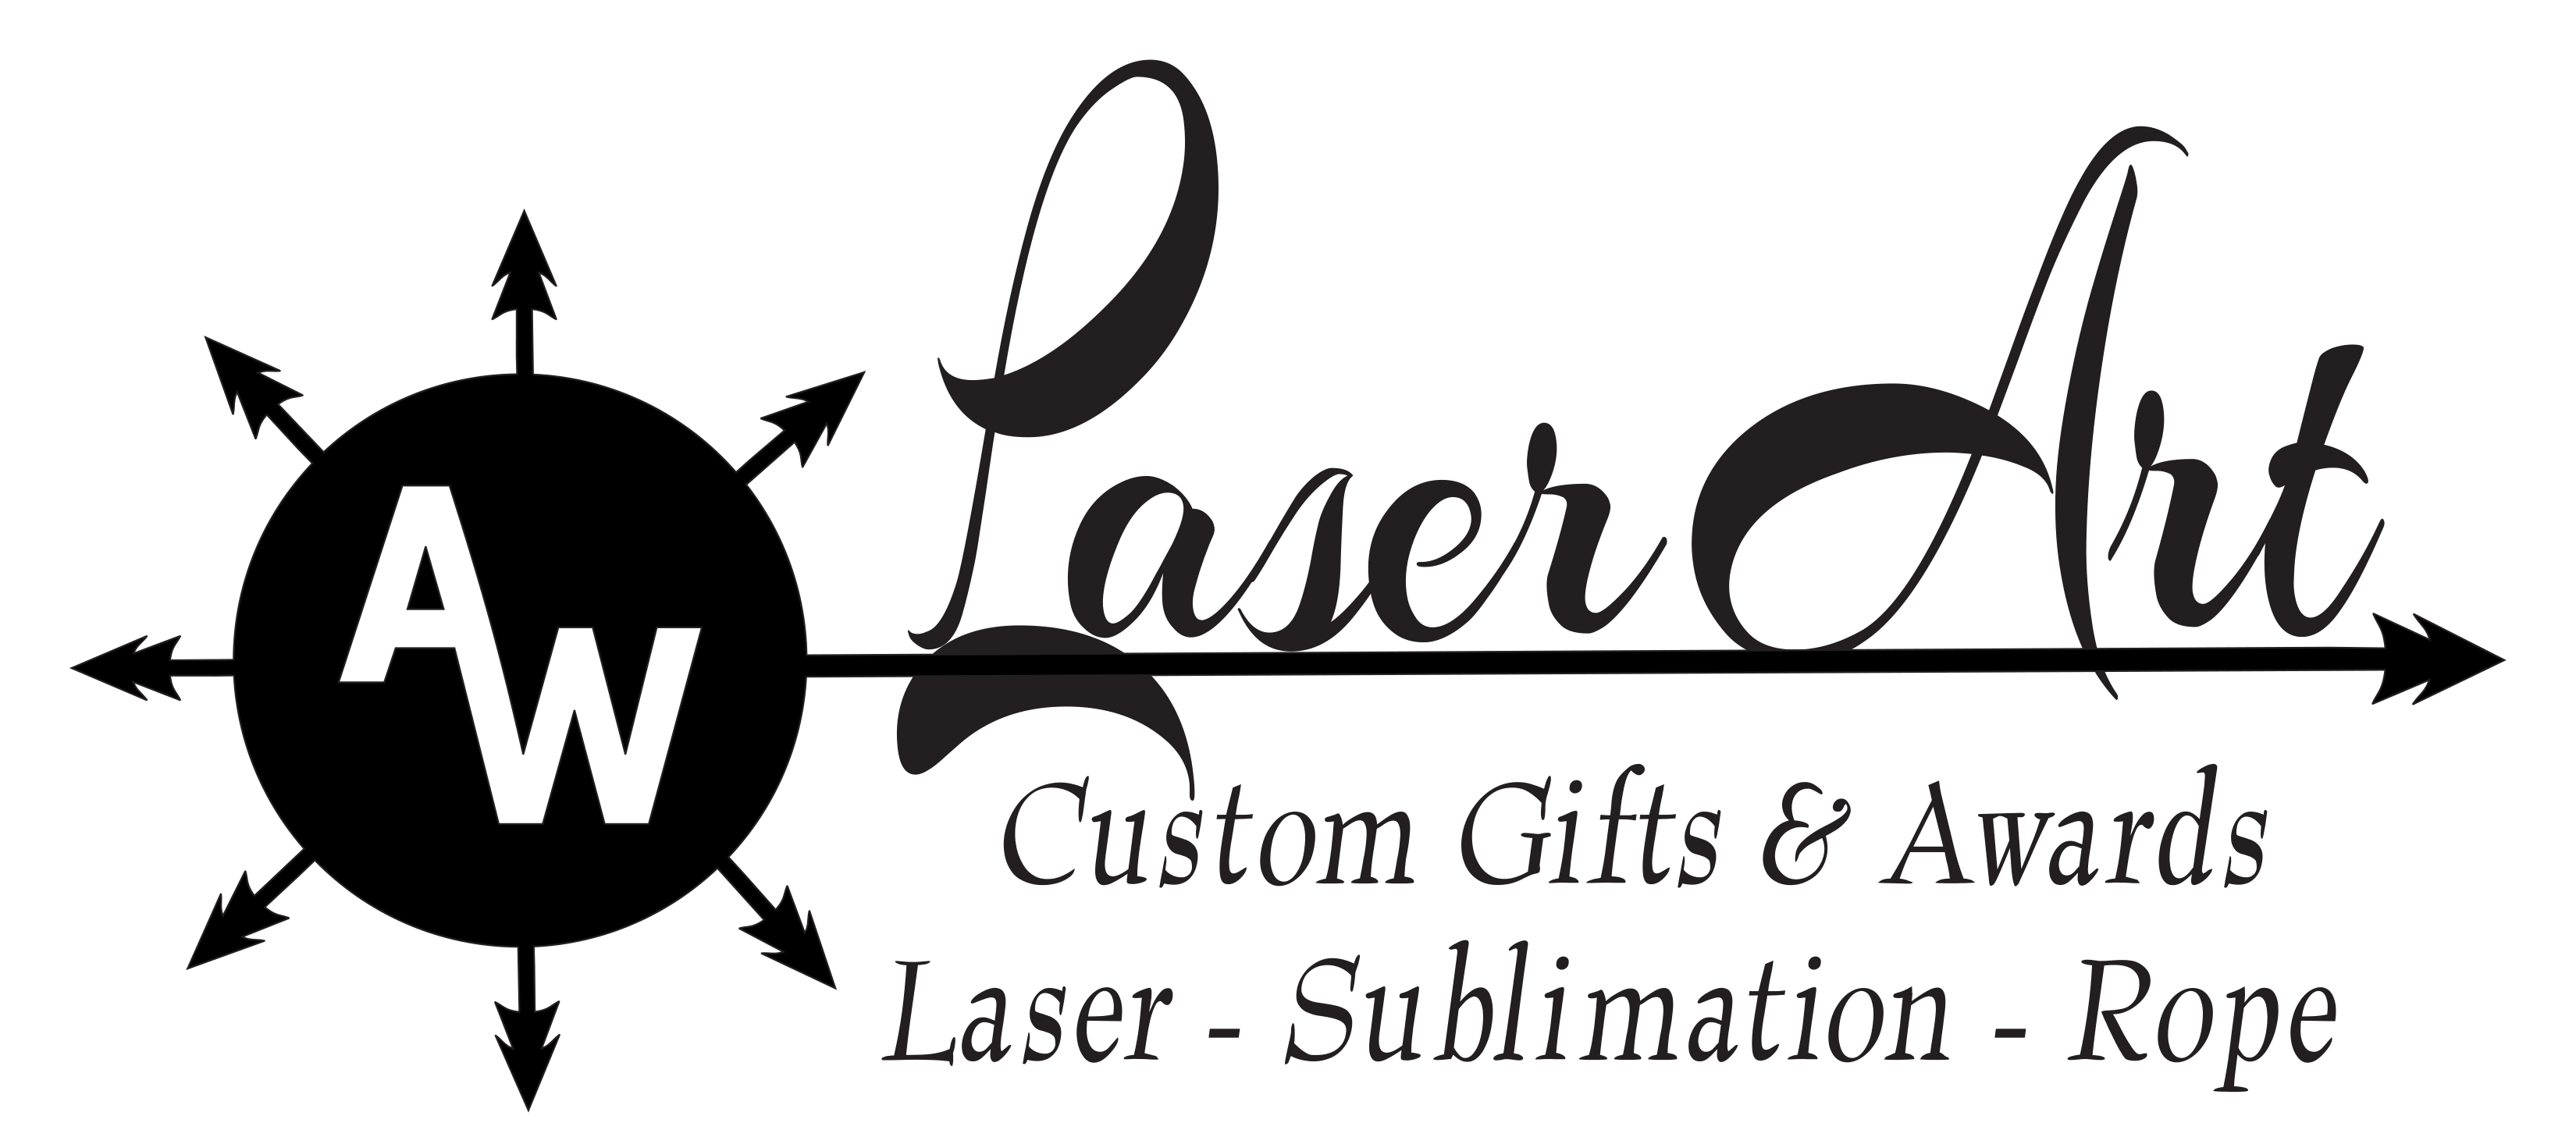 AW Laser Art